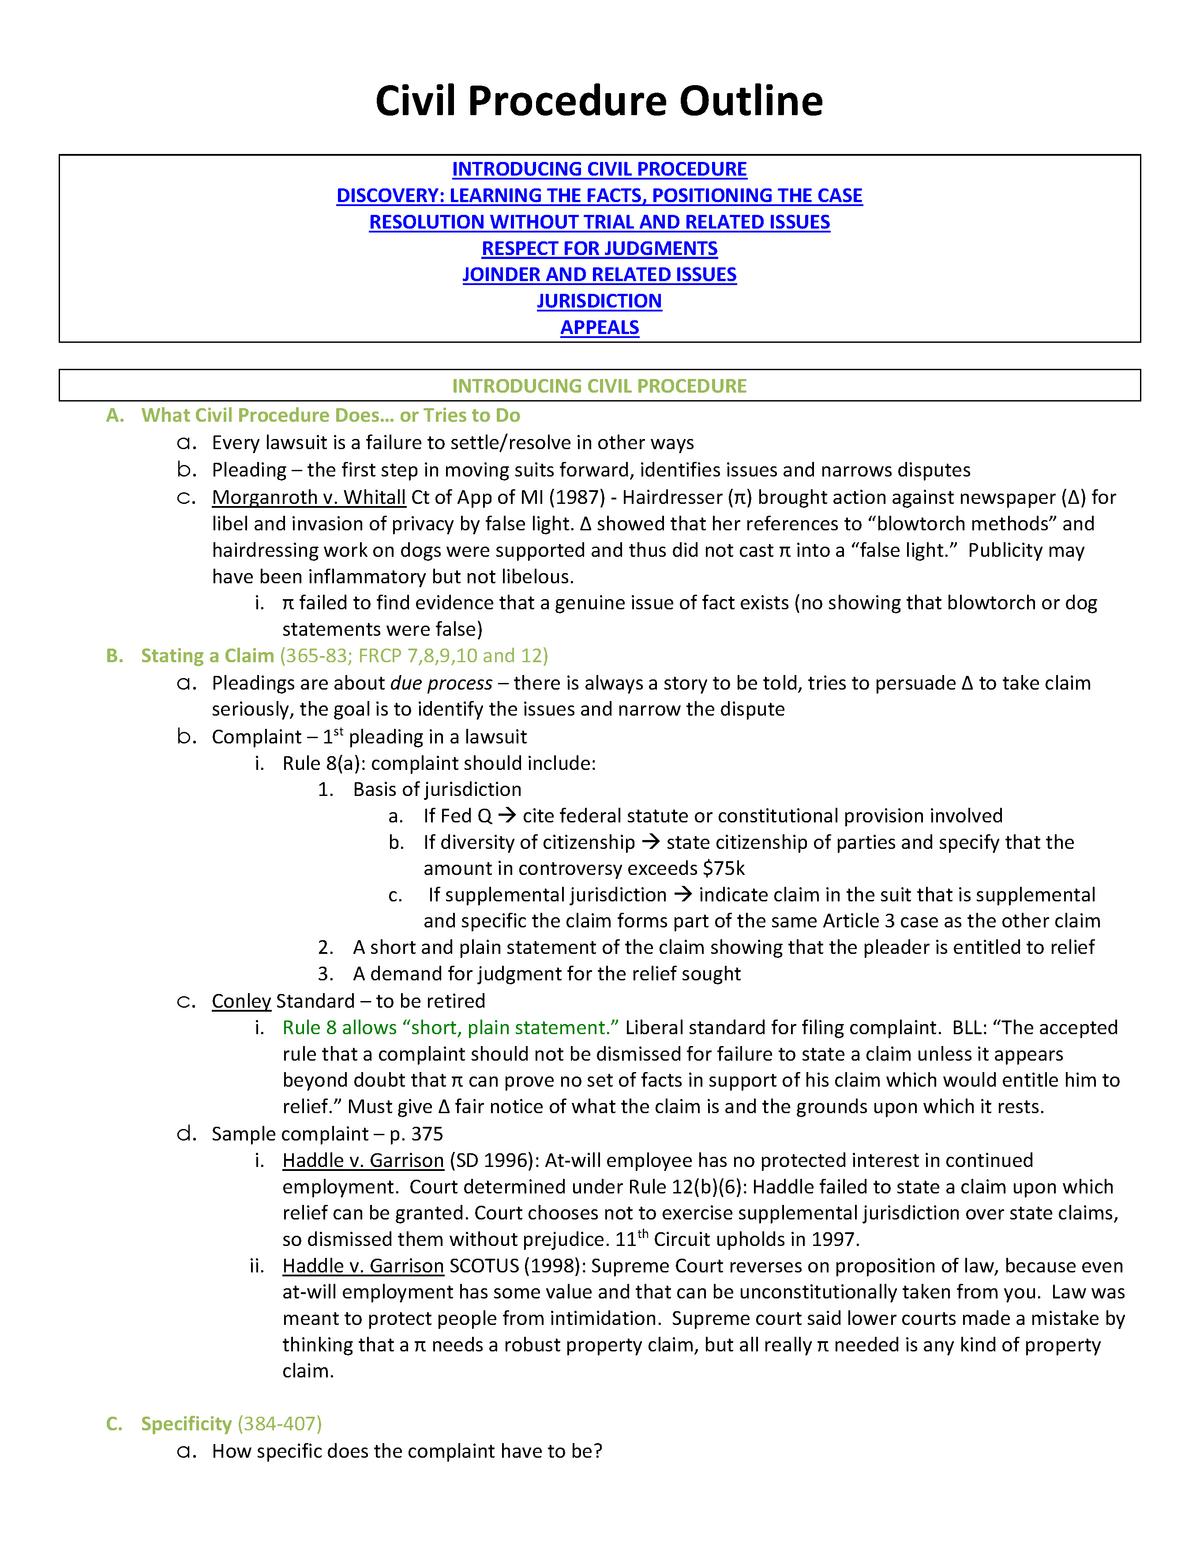 Civil Procedure Notes And Outline - LAW 510 - U-M - StuDocu